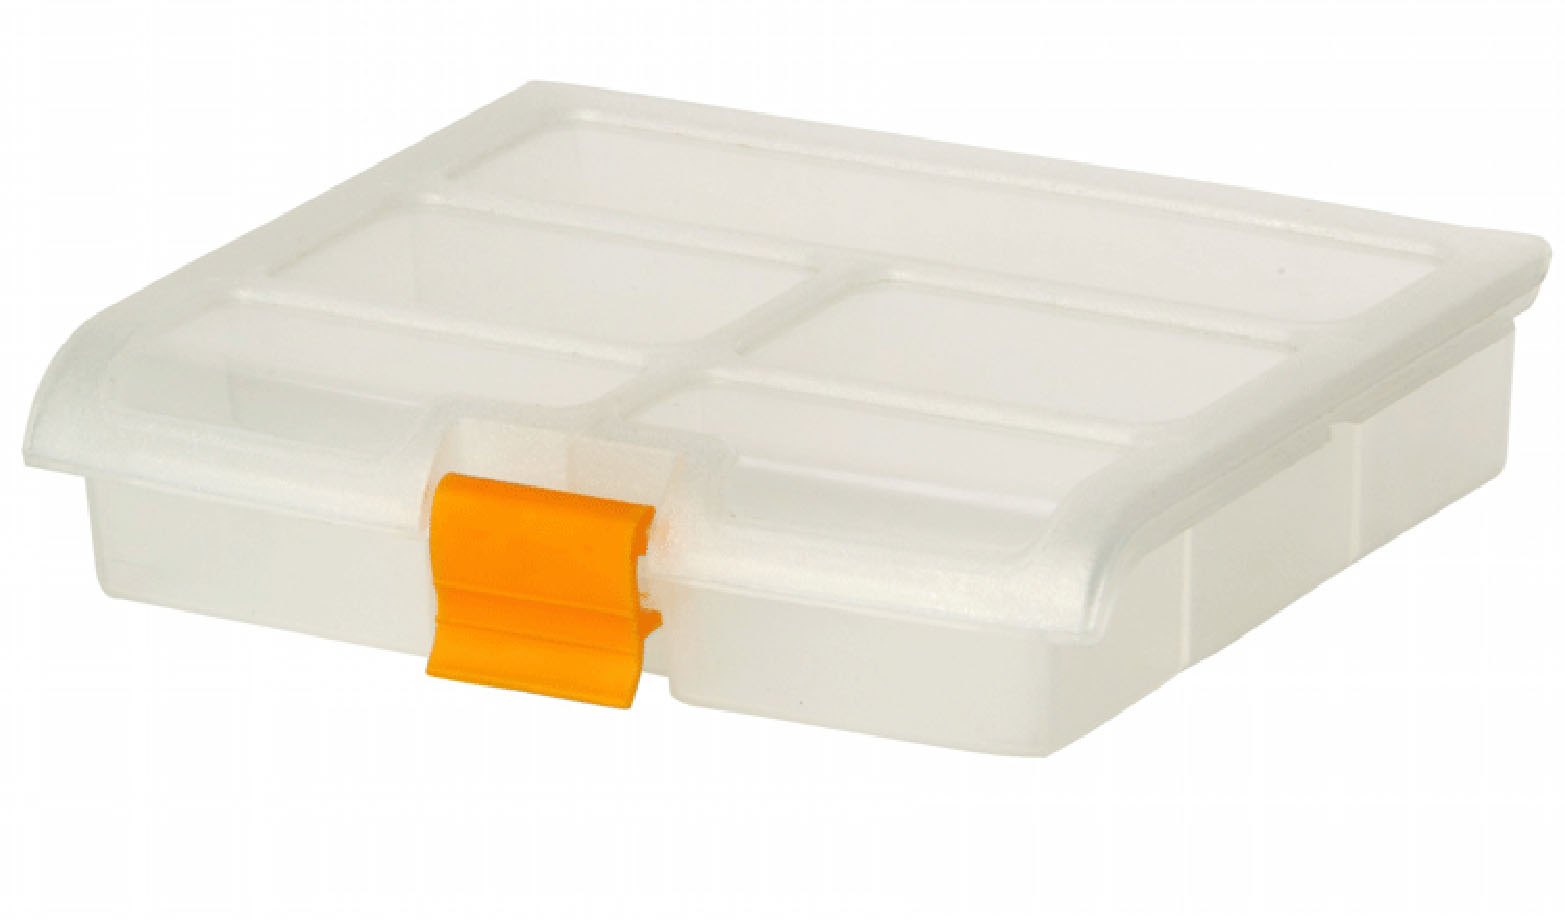 Блок для мелочей Idea, 16,5 см х 13,5 см х 3,5 см подставка для моющих средств idea цвет салатовый 10 5 х 12 5 х 18 5 см